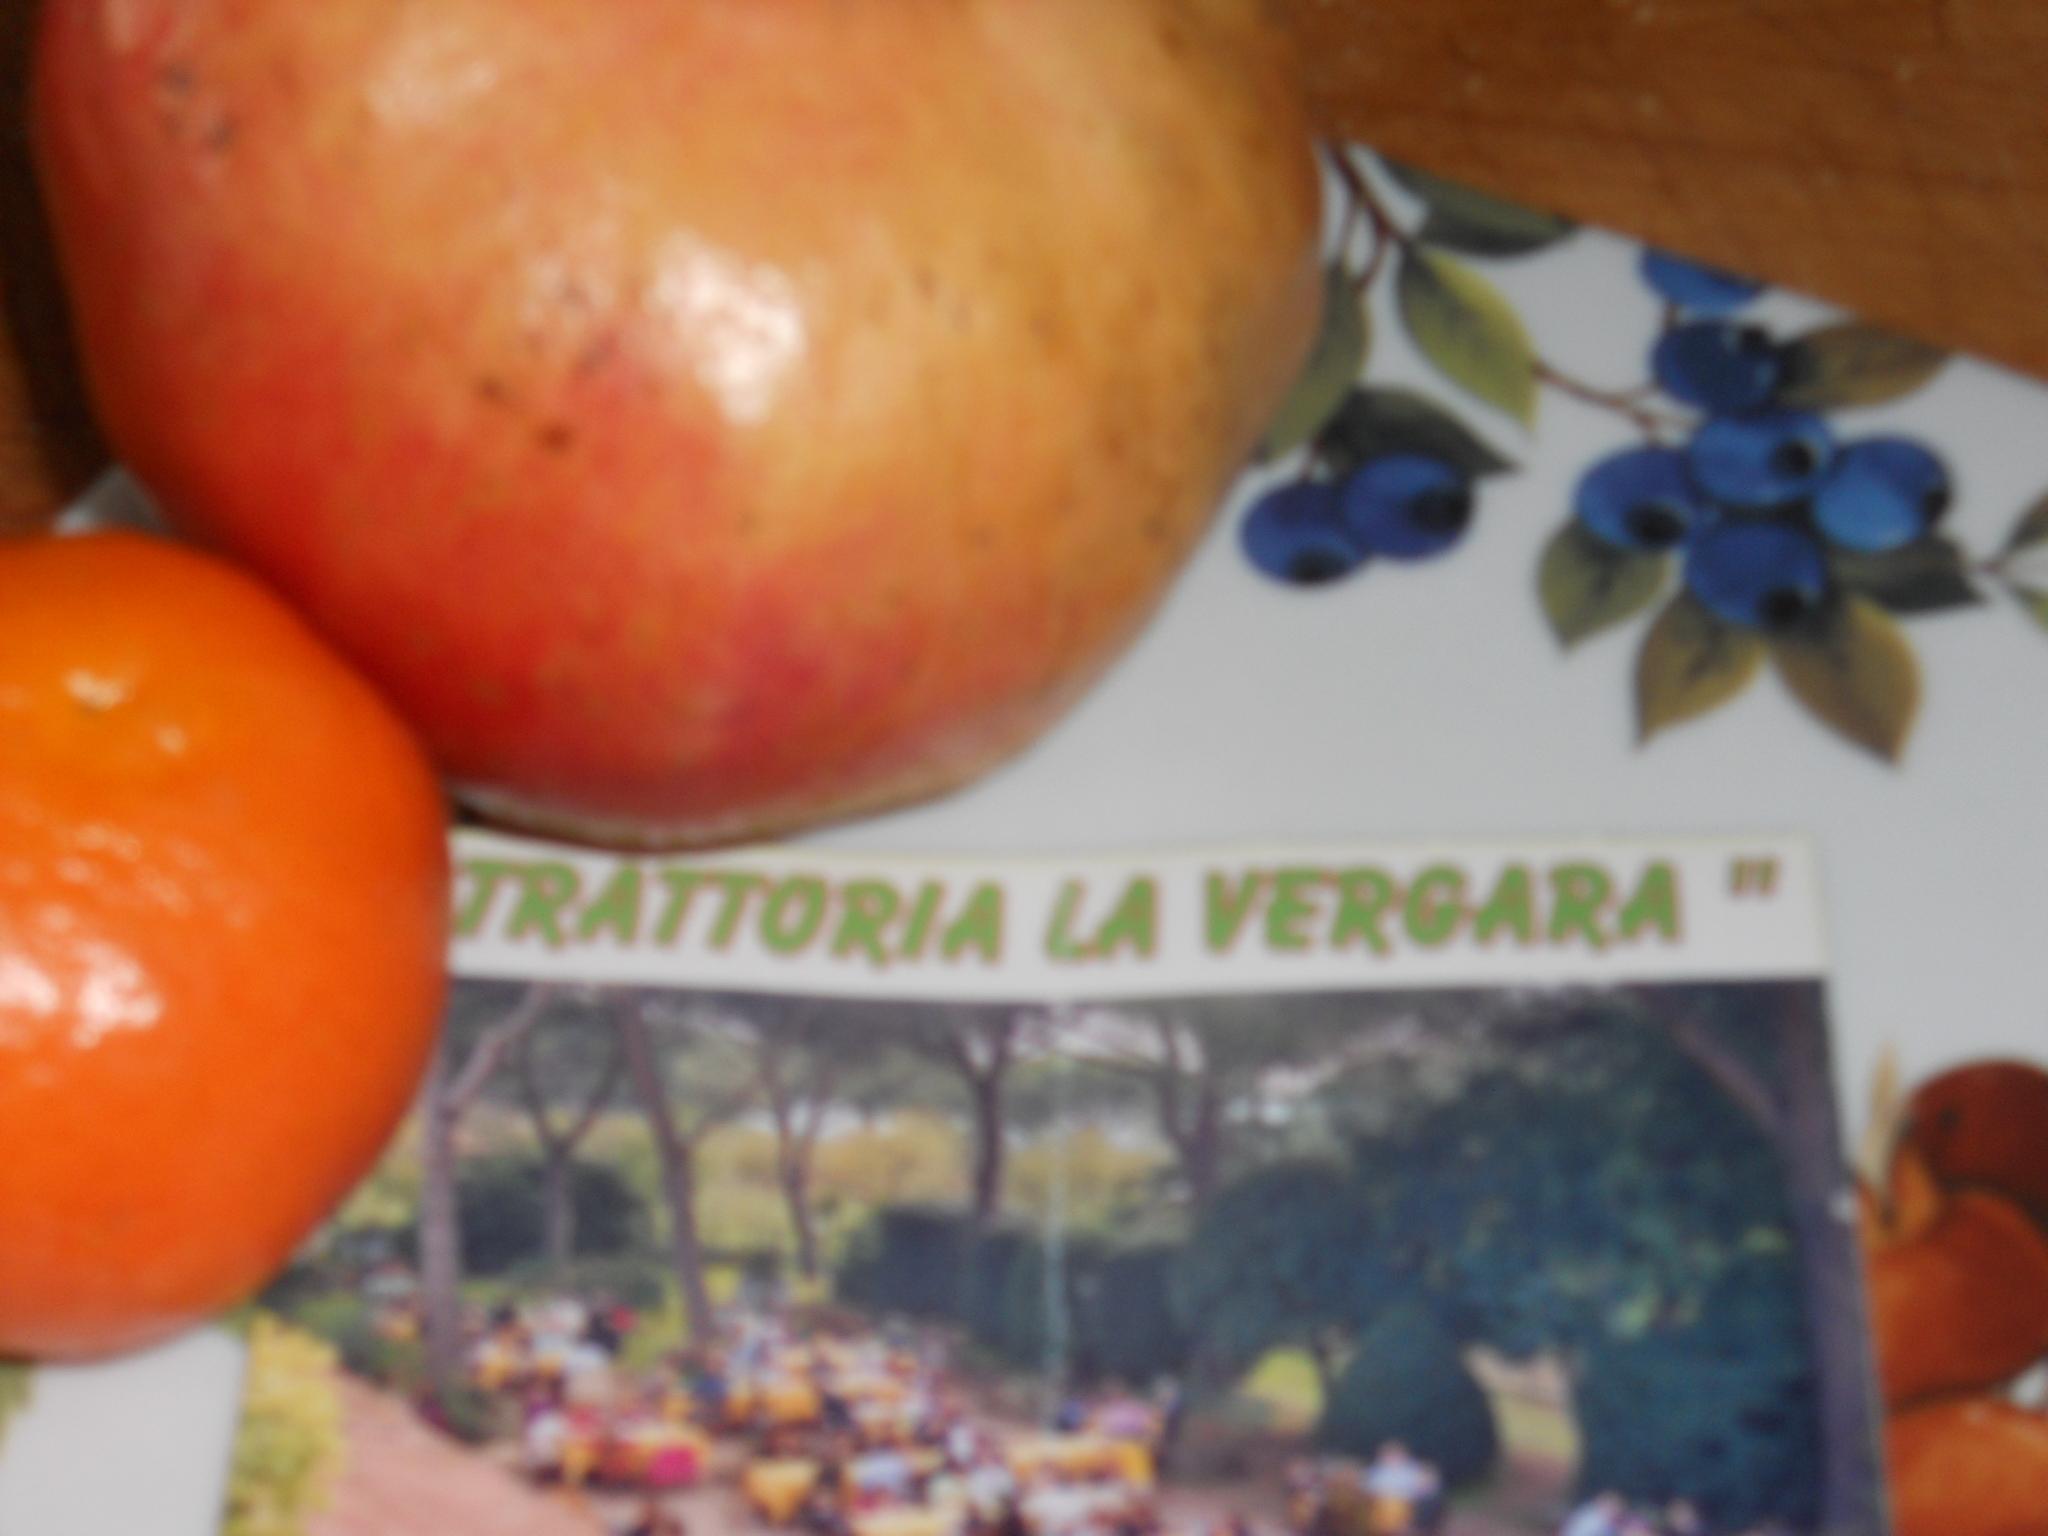 Verdolini d'annata animano La Vergara